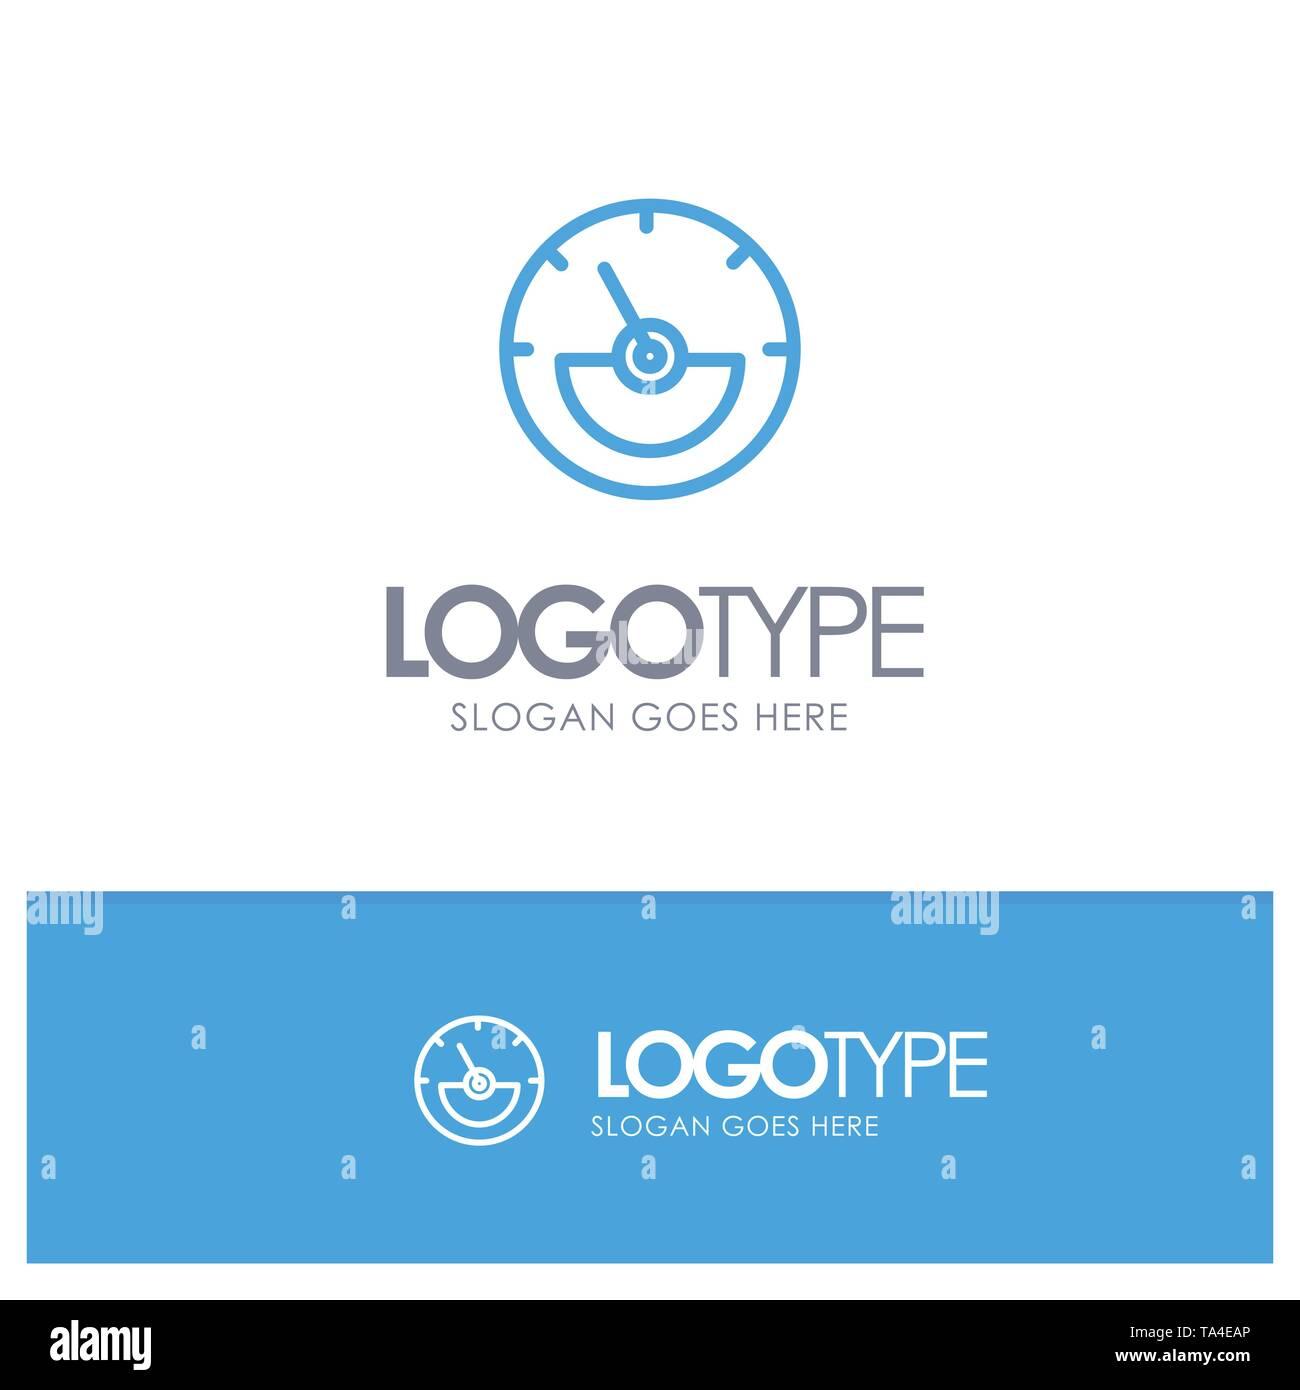 Ampere, Ampere Meter, Electrical, Energy Blue Outline Logo Place for Tagline - Stock Image